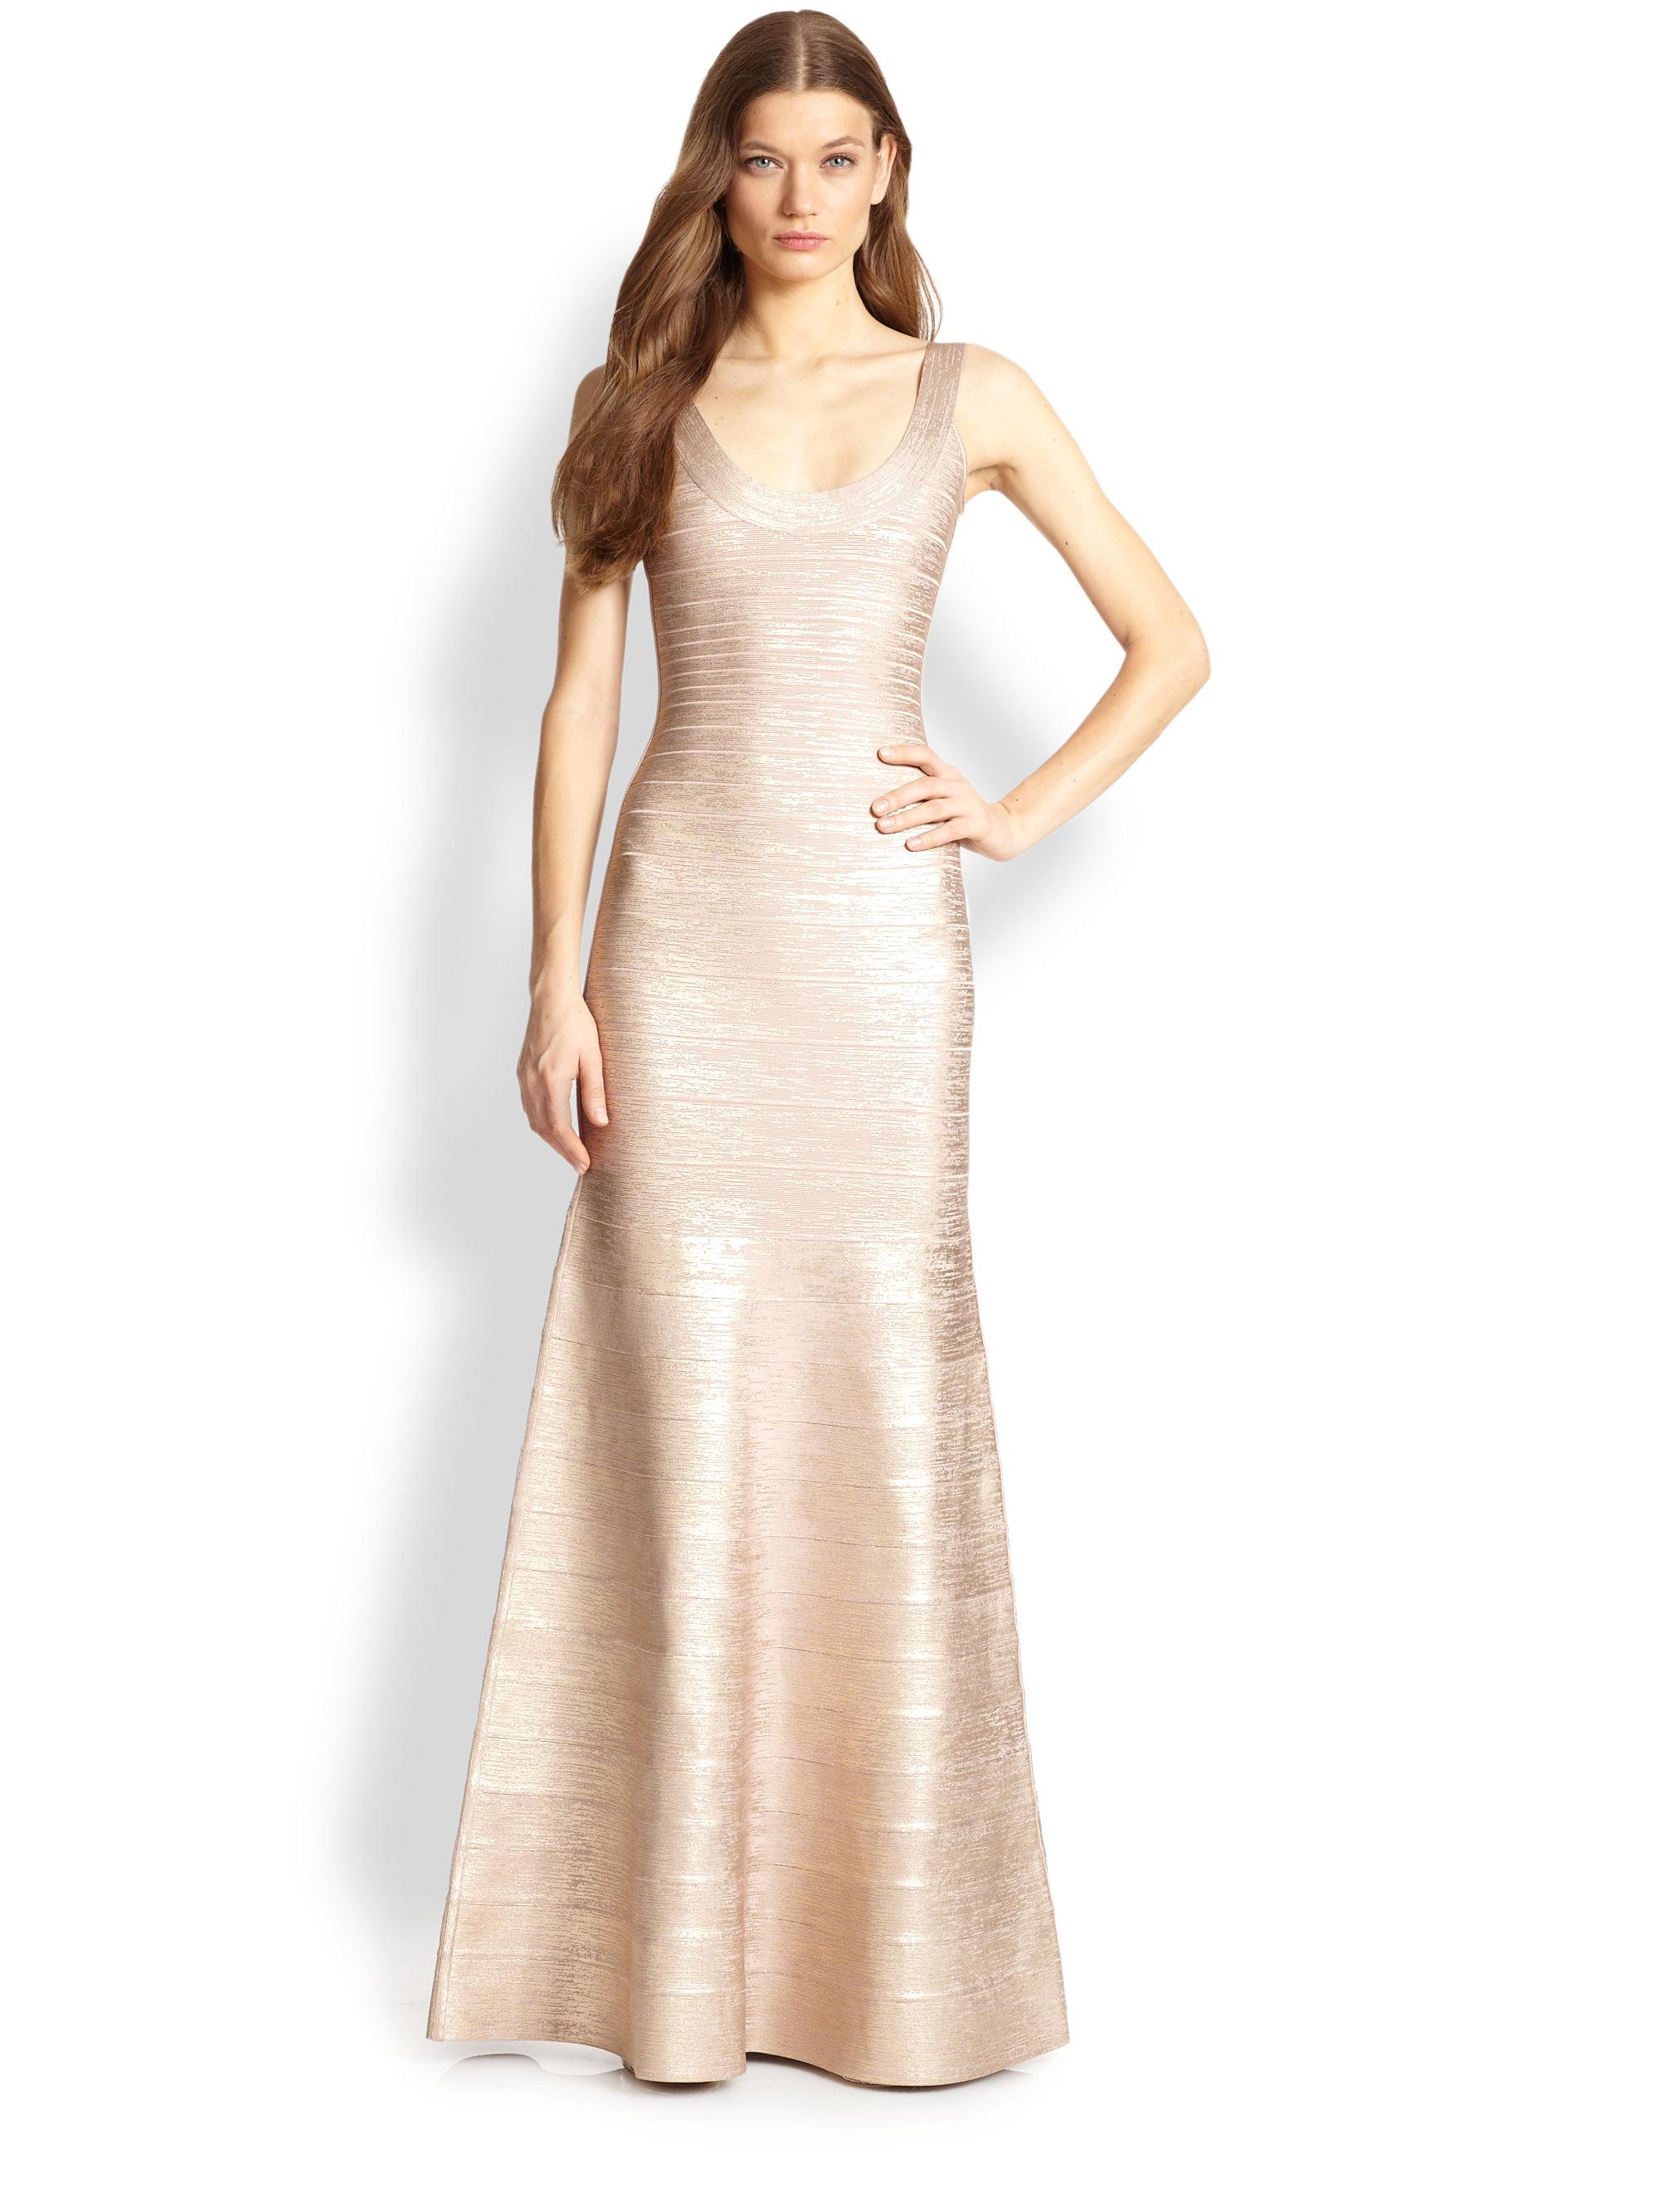 Lyst - Hervé Léger Foilprinted Bandage Gown in Metallic